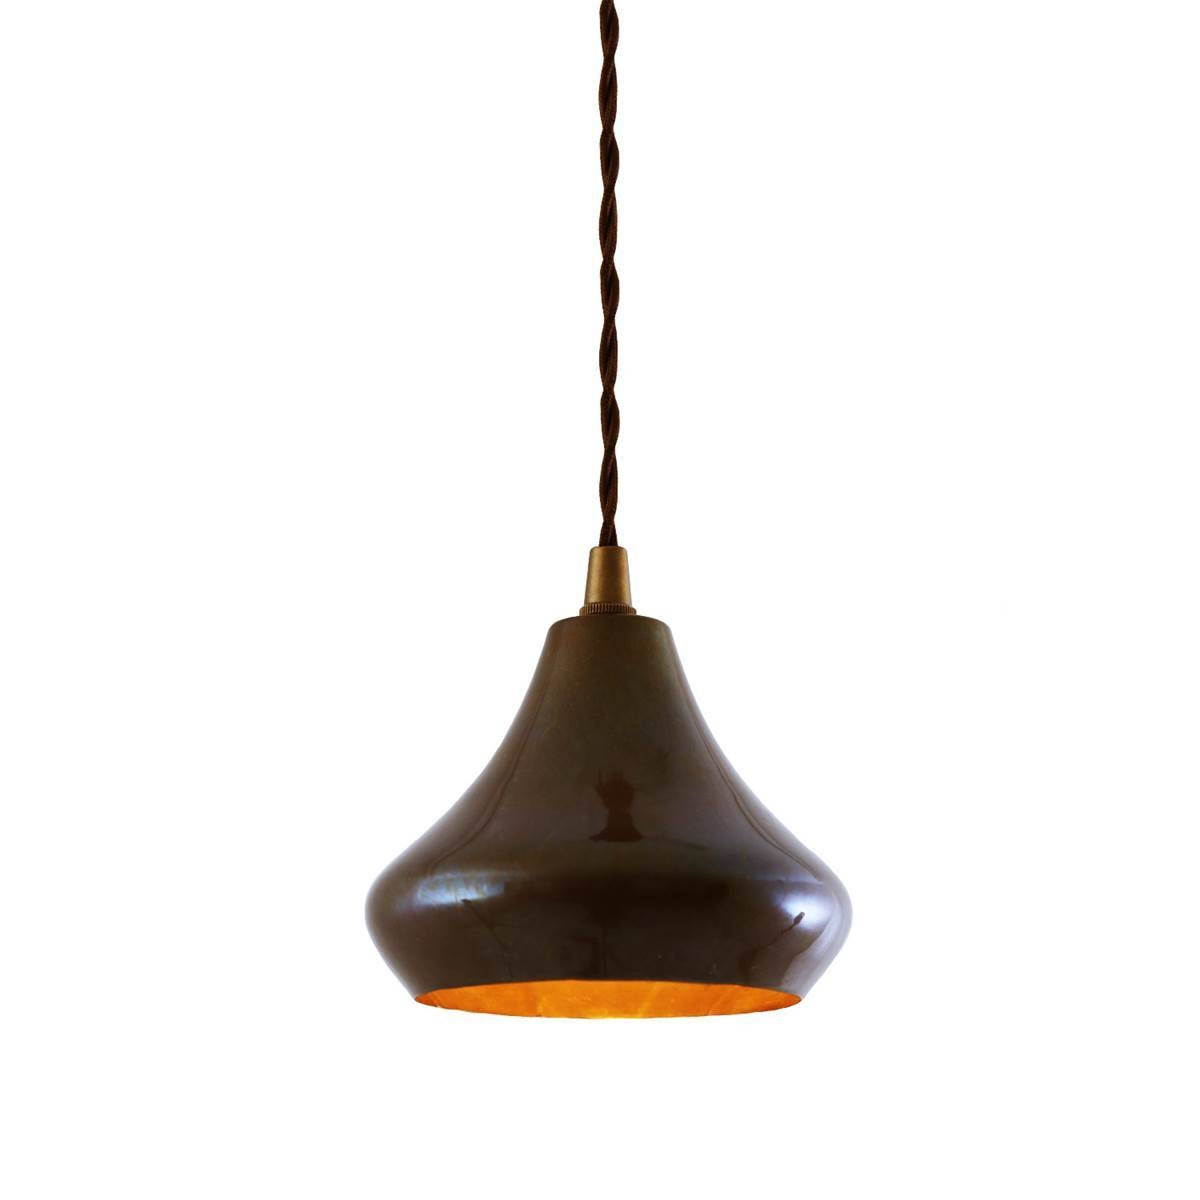 Lamp: Moroccan Pendant Light Fixtures That Will Transform Your regarding Old World Pendant Lighting (Image 3 of 15)